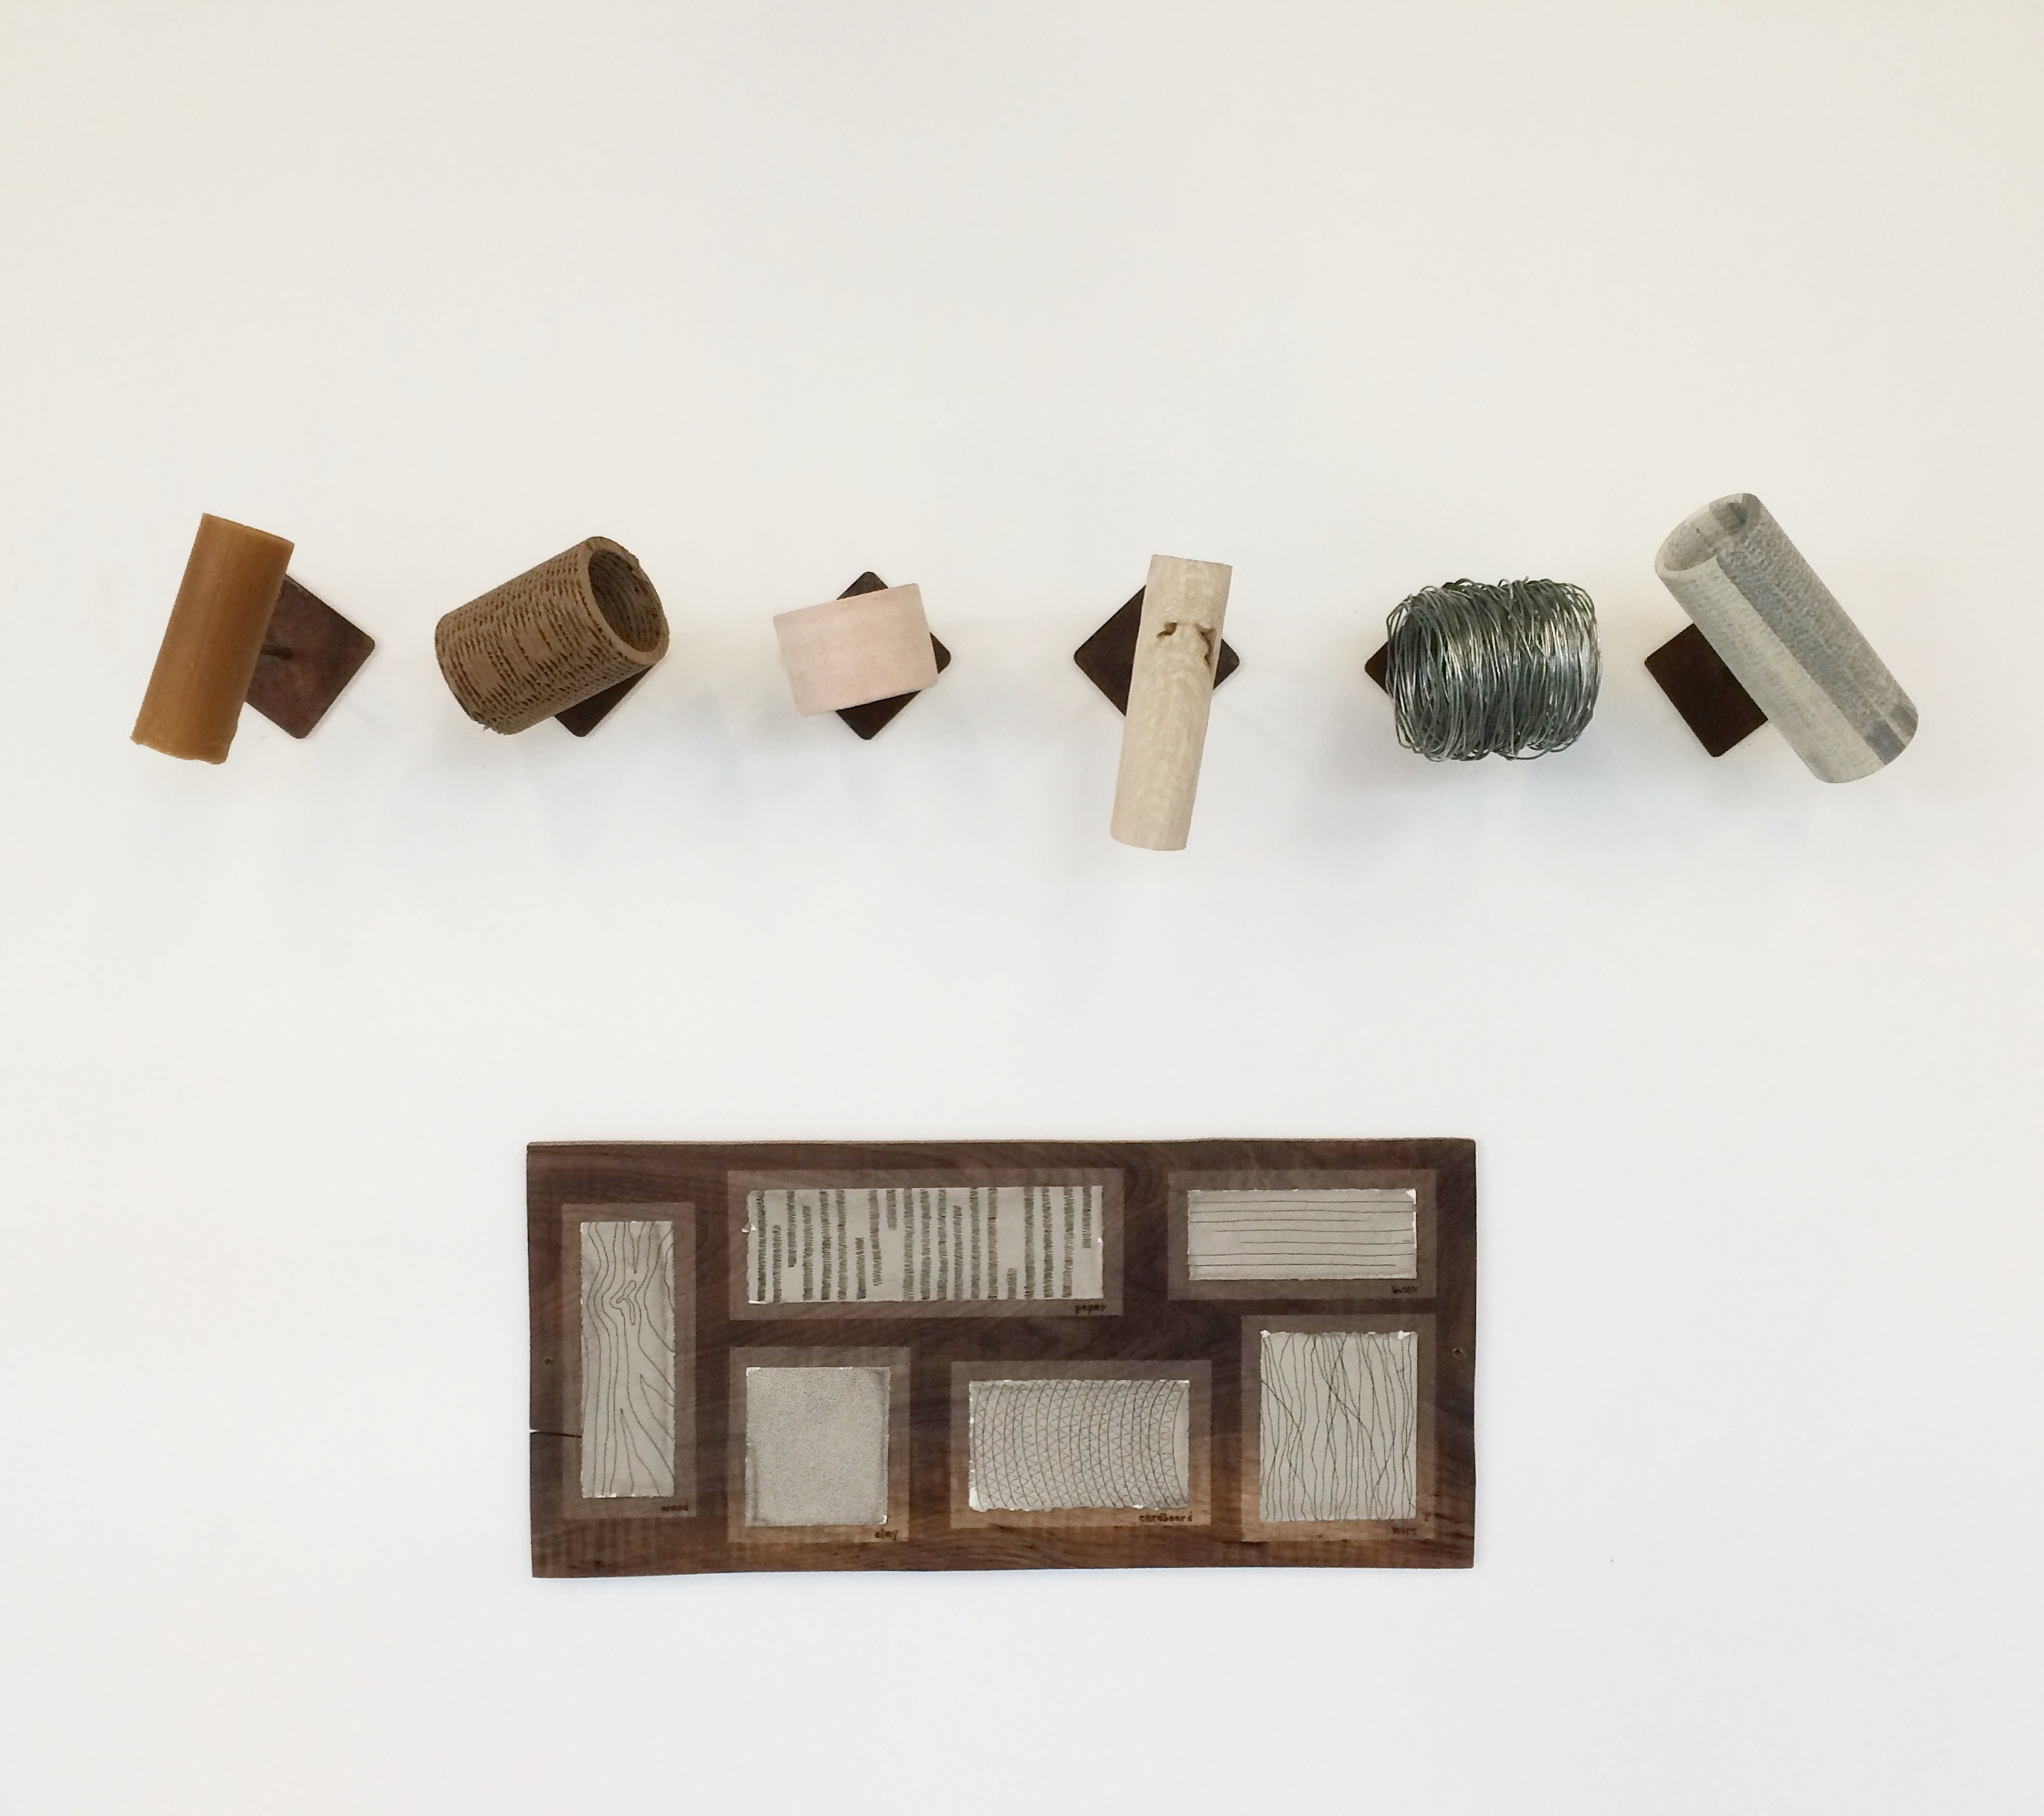 Untitled Materials Exploration